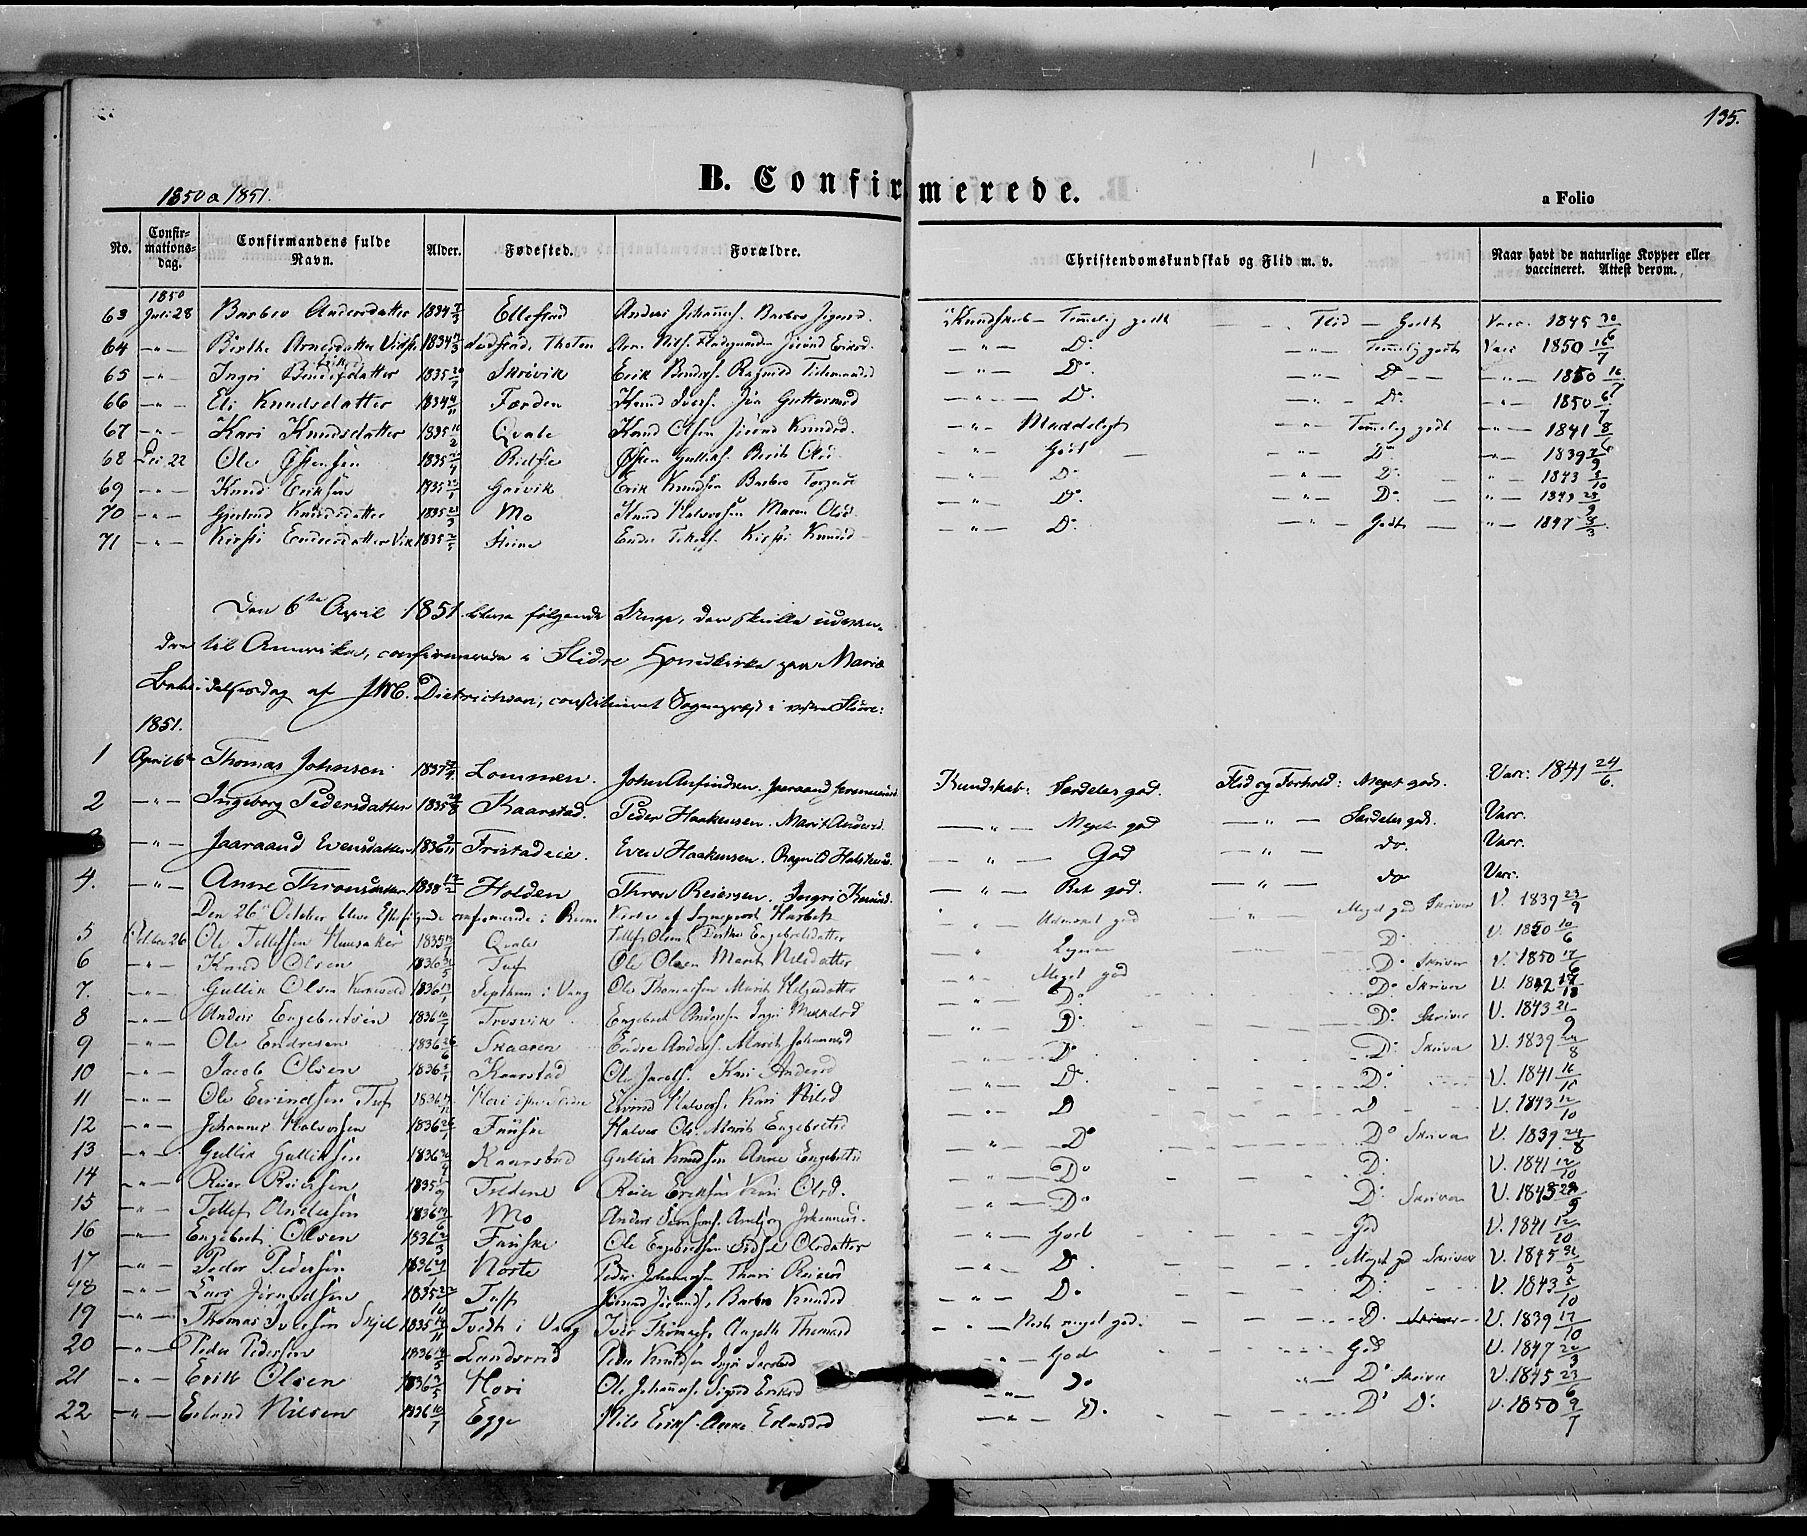 SAH, Vestre Slidre prestekontor, Ministerialbok nr. 1, 1844-1855, s. 135